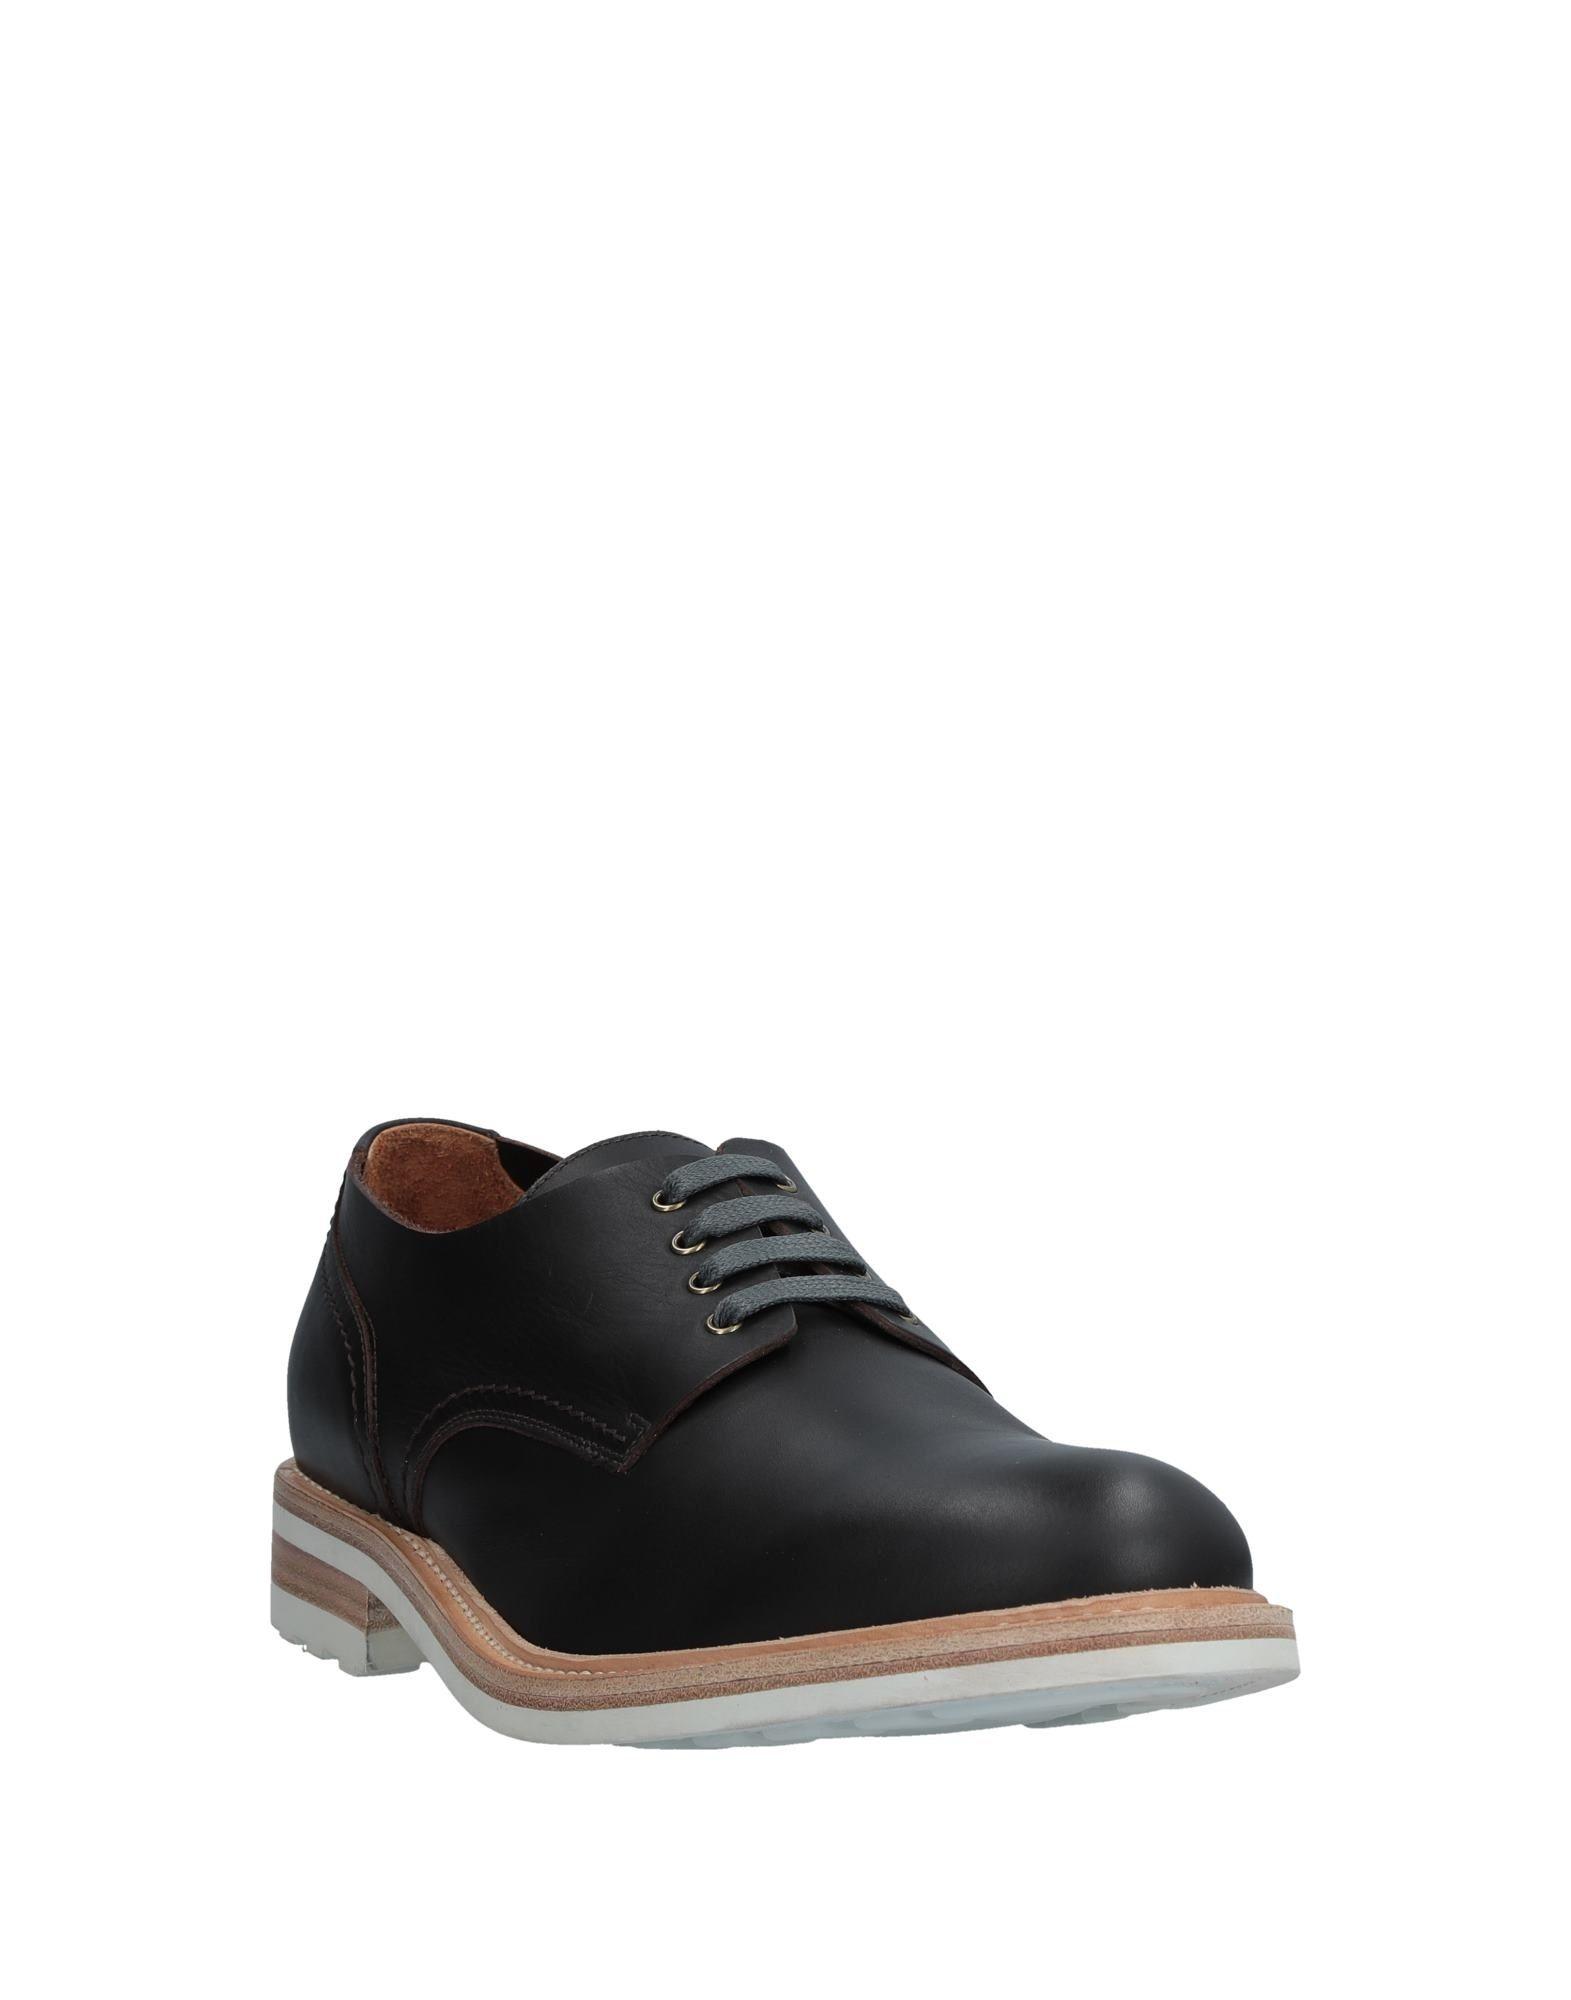 Buttero® Schnürschuhe Herren  11544150LK Gute Qualität beliebte Schuhe